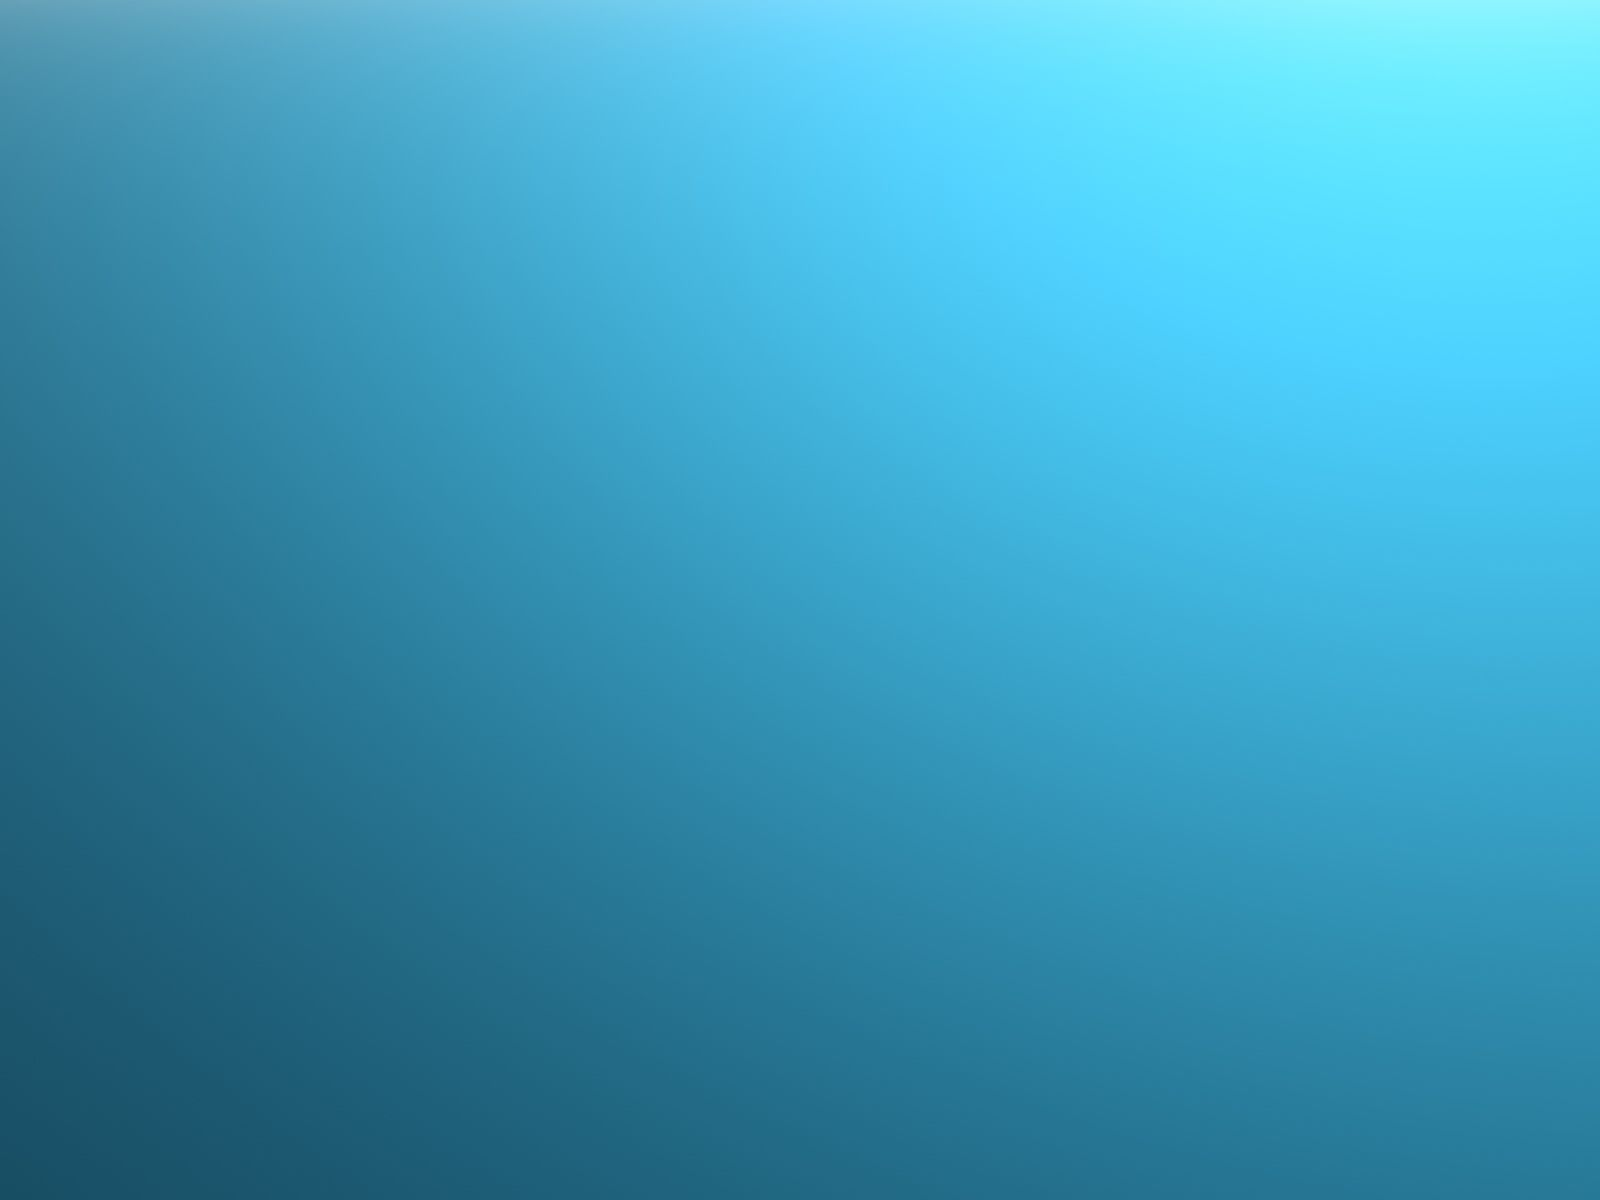 Light Blue Branding Google Search Iphone Wallpaper Colorful Wallpaper Blue Wallpapers